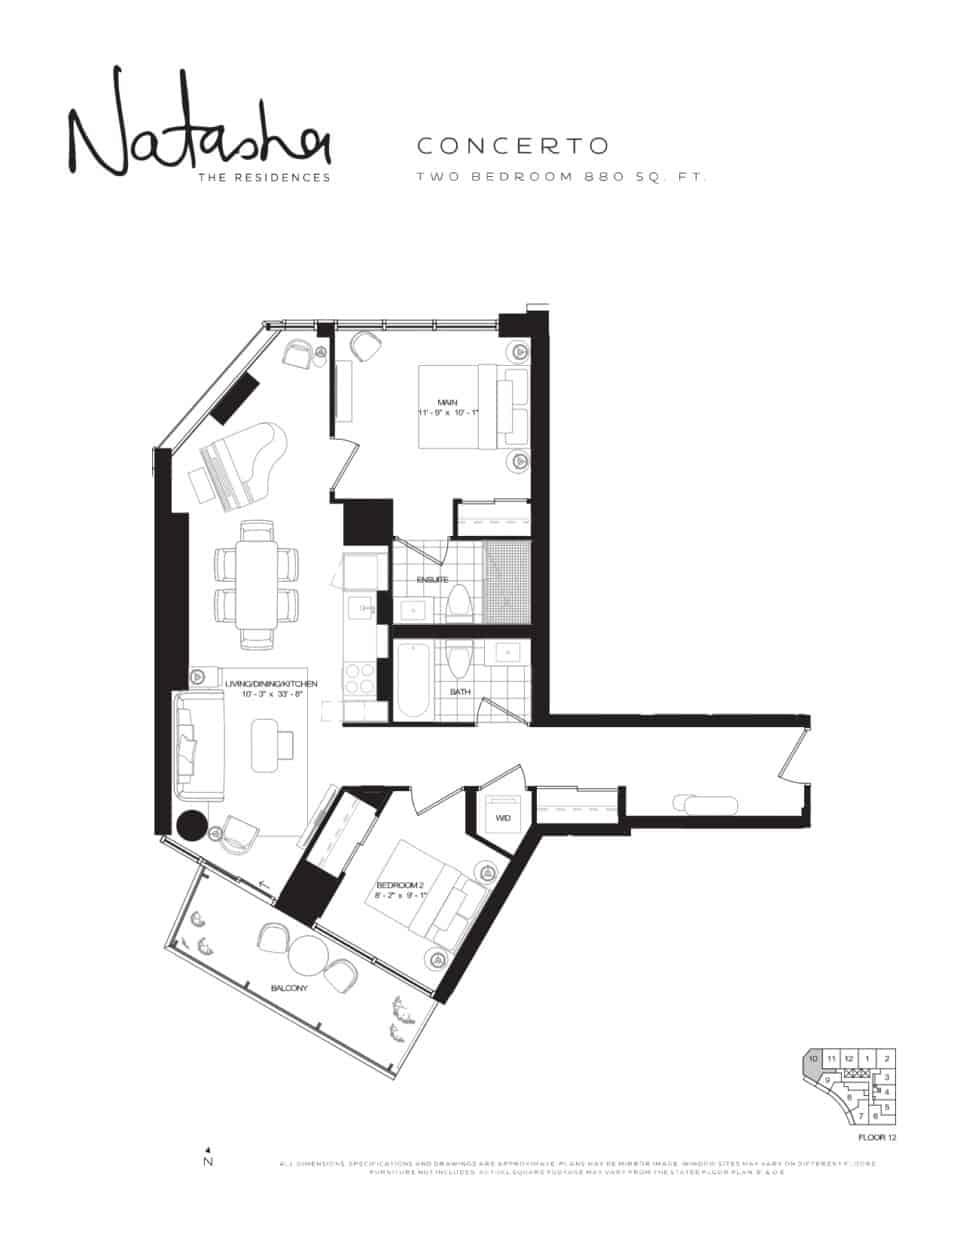 2021 09 02 11 02 08 natashatheresidences lanterradevelopments floorplans concerto